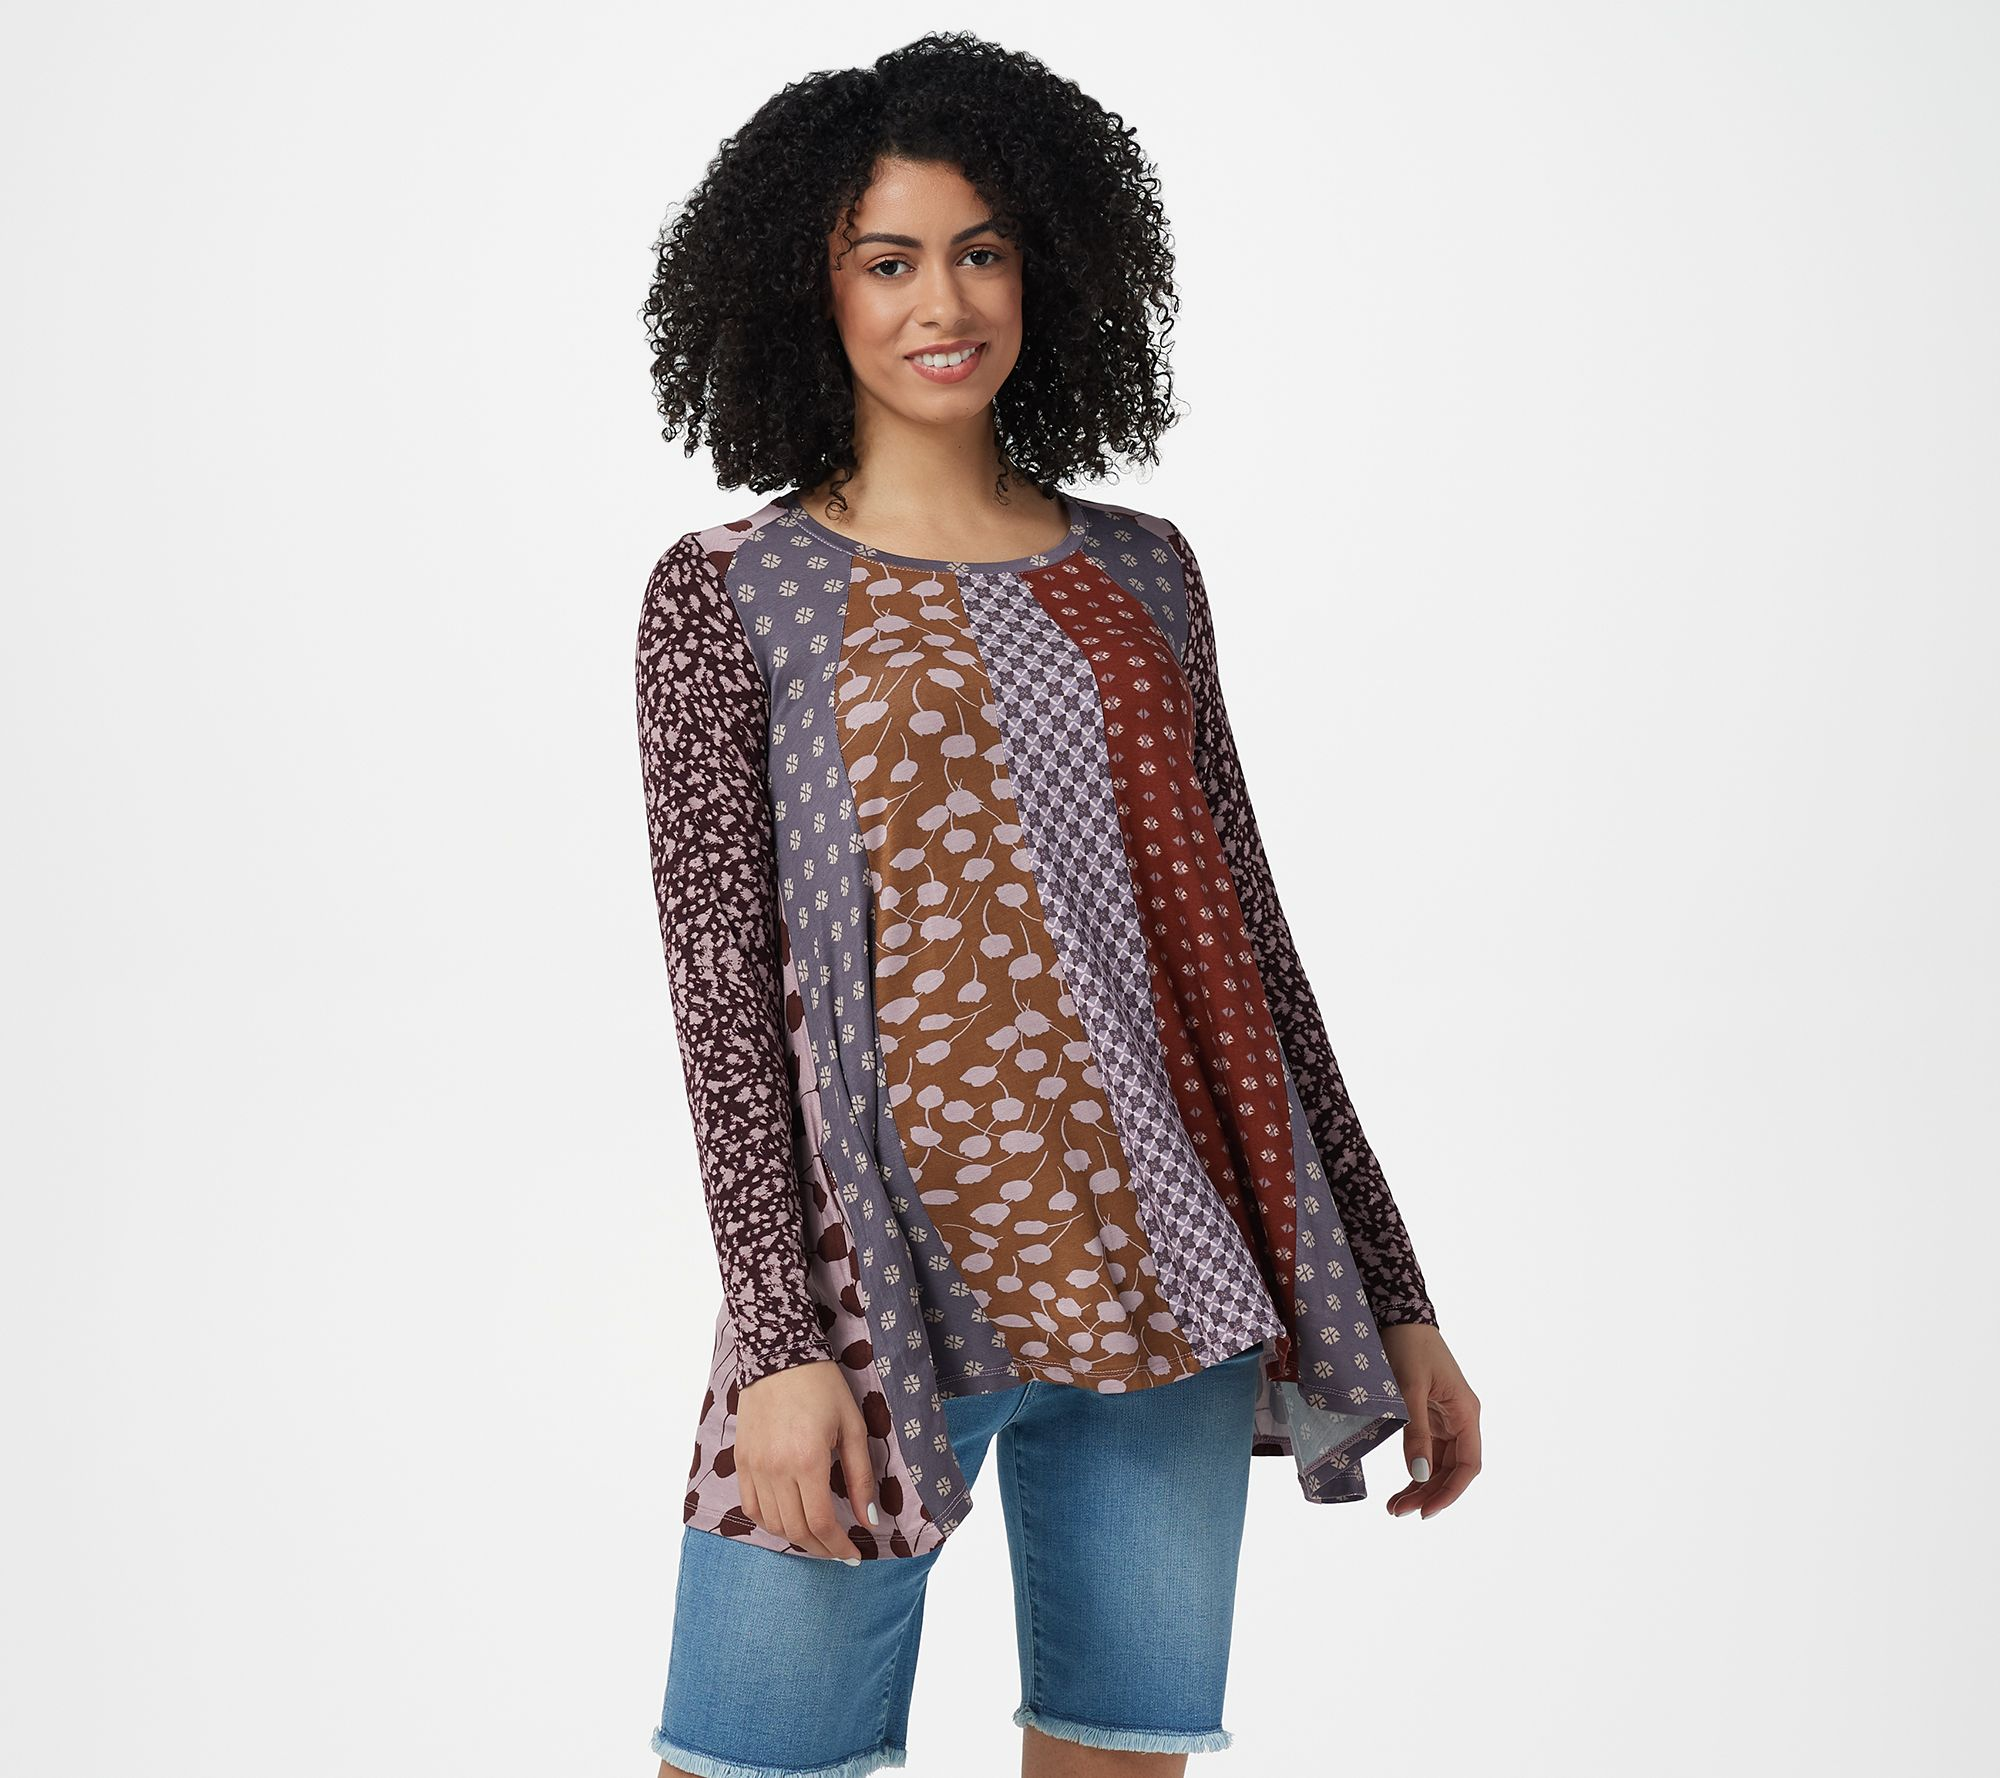 LOGO by Lori Goldstein Women/'s XX-Small 3//4 Sleeve Floral Animal Print Knit Top